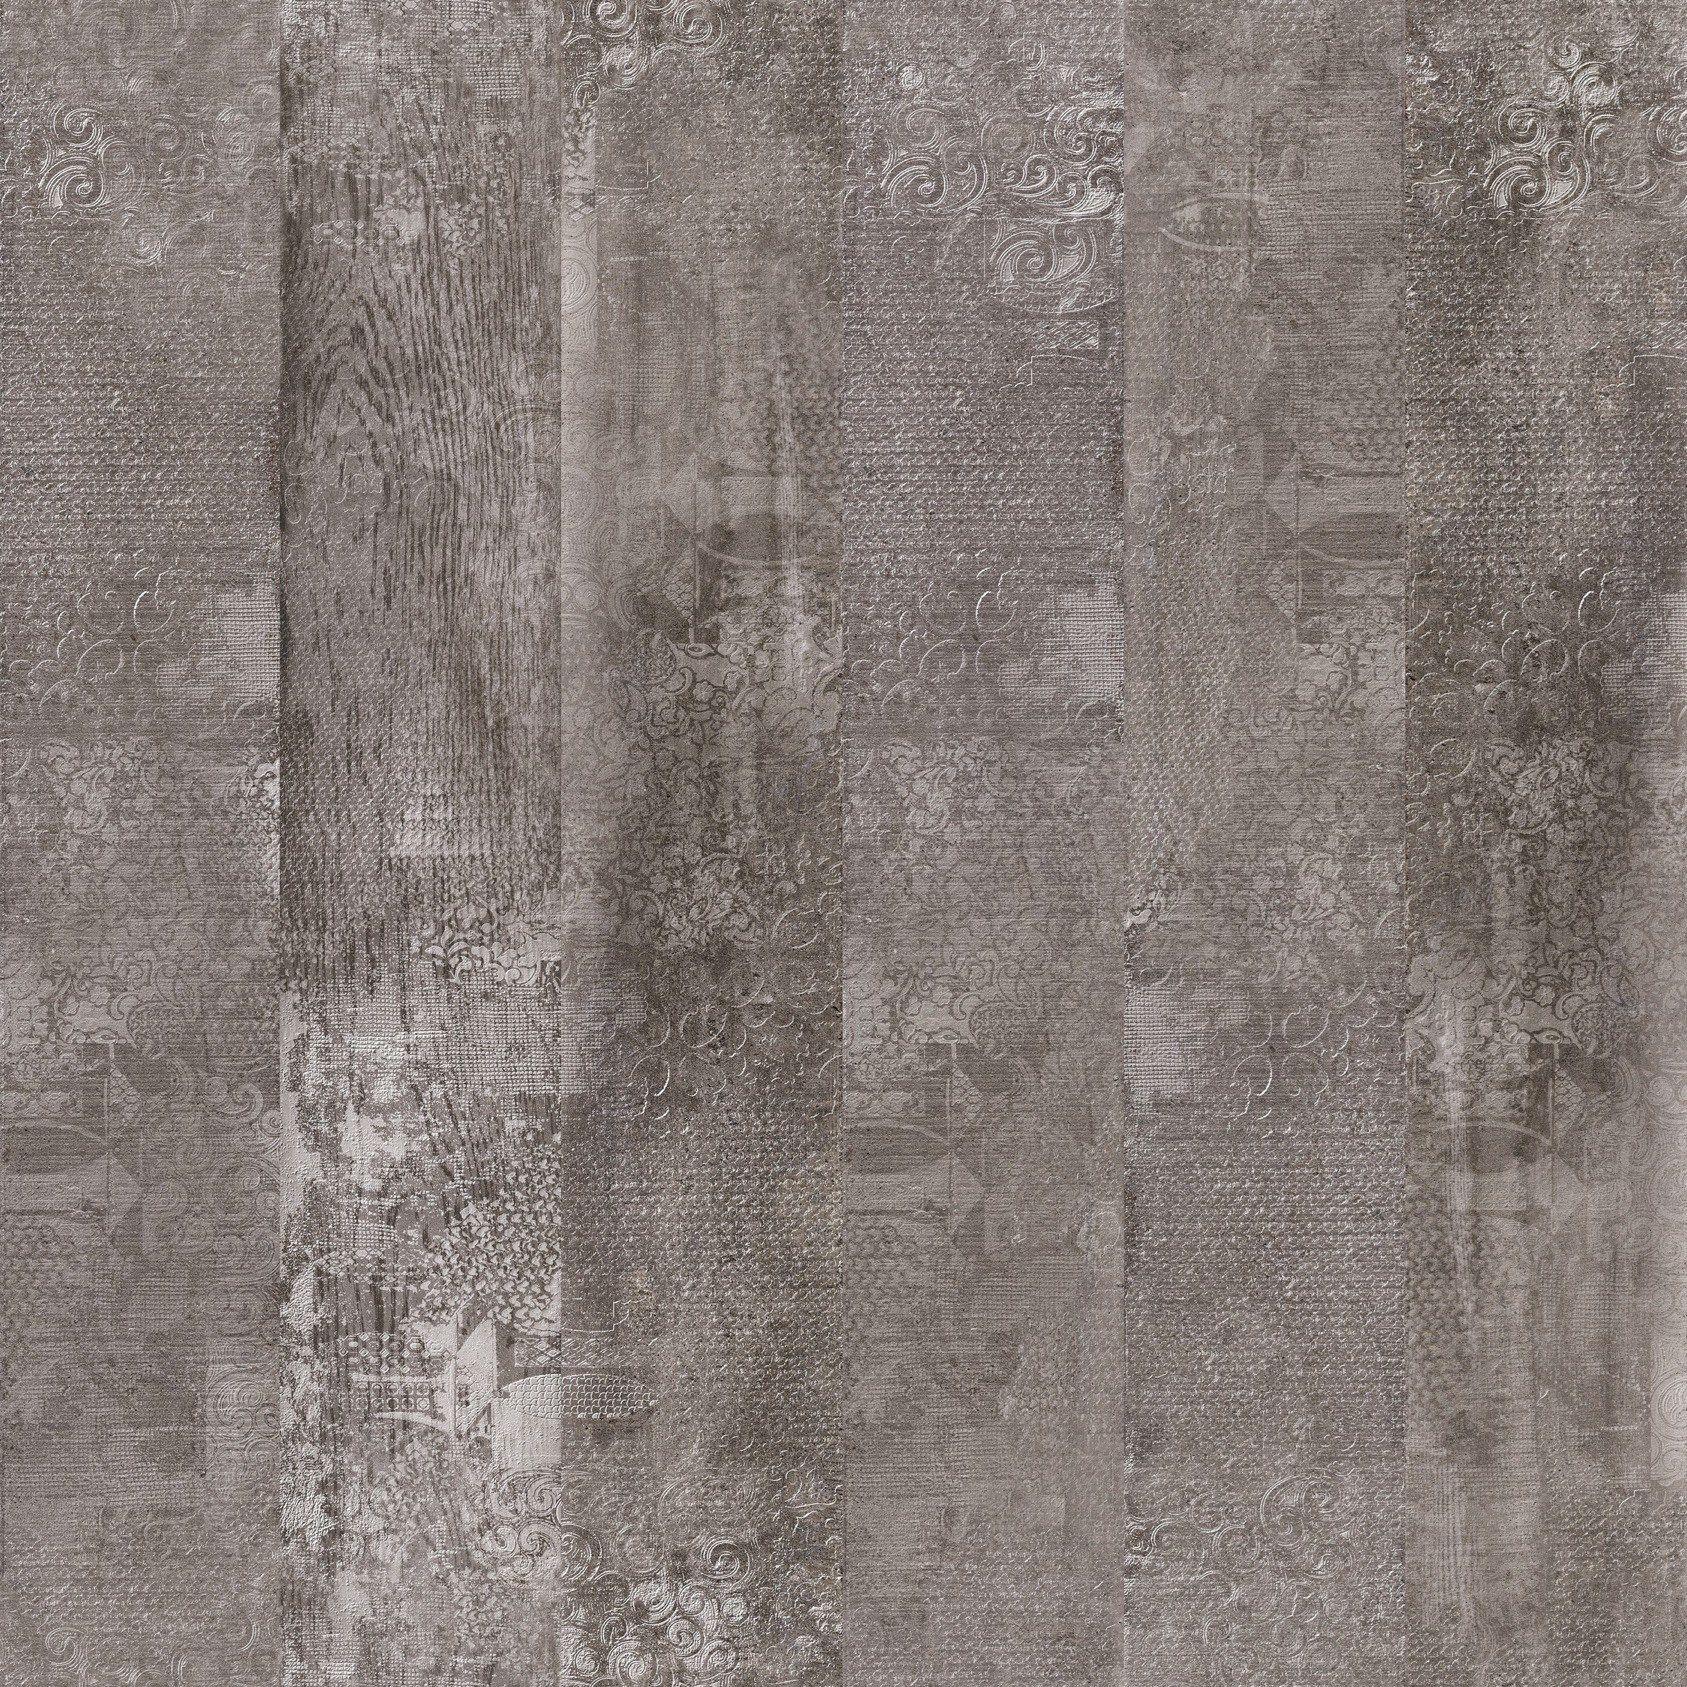 Carta Da Parati Texture carta da parati panoramica effetto cemento portland